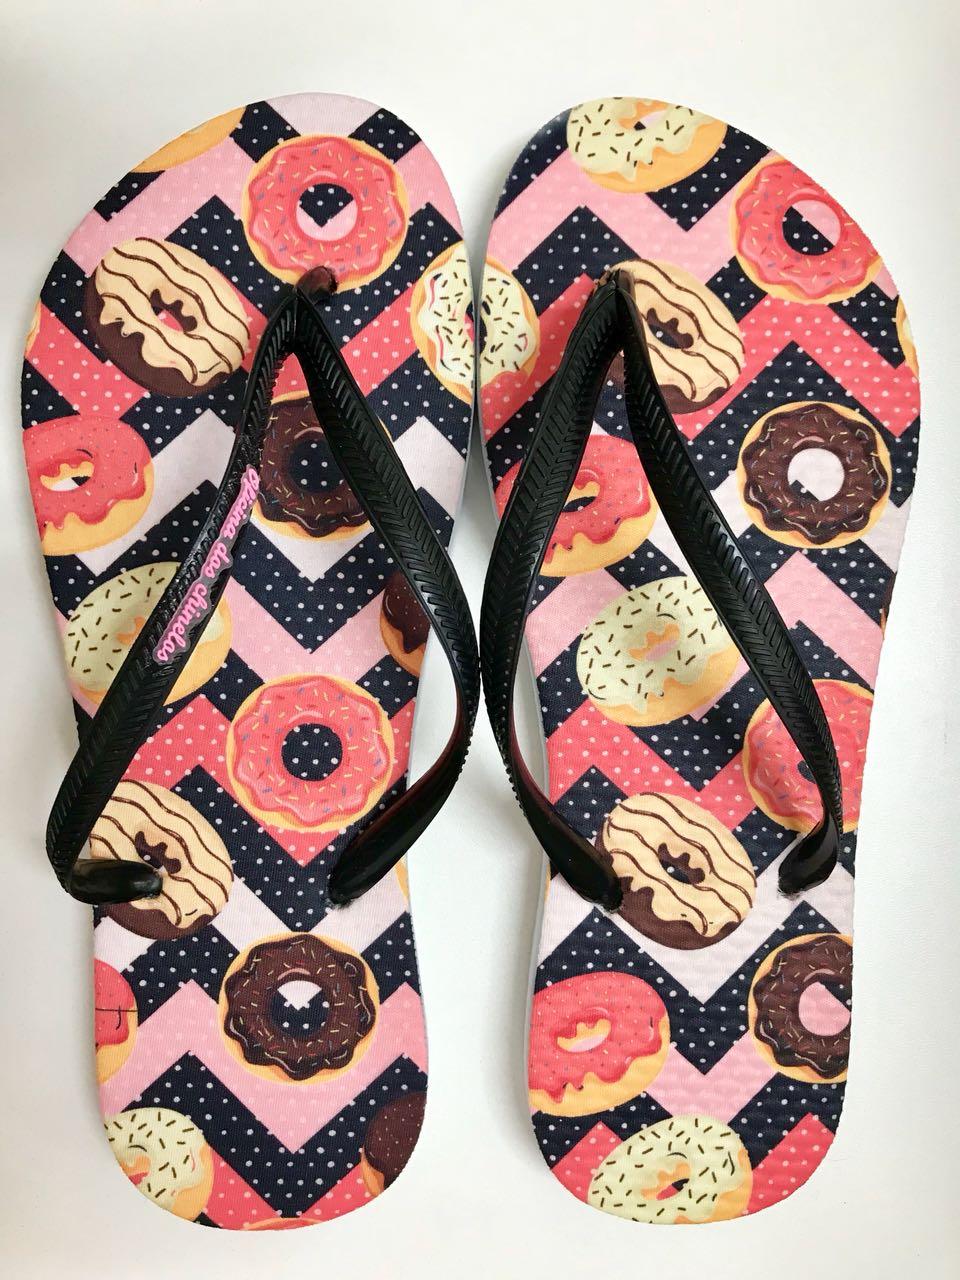 Donuts zigzag